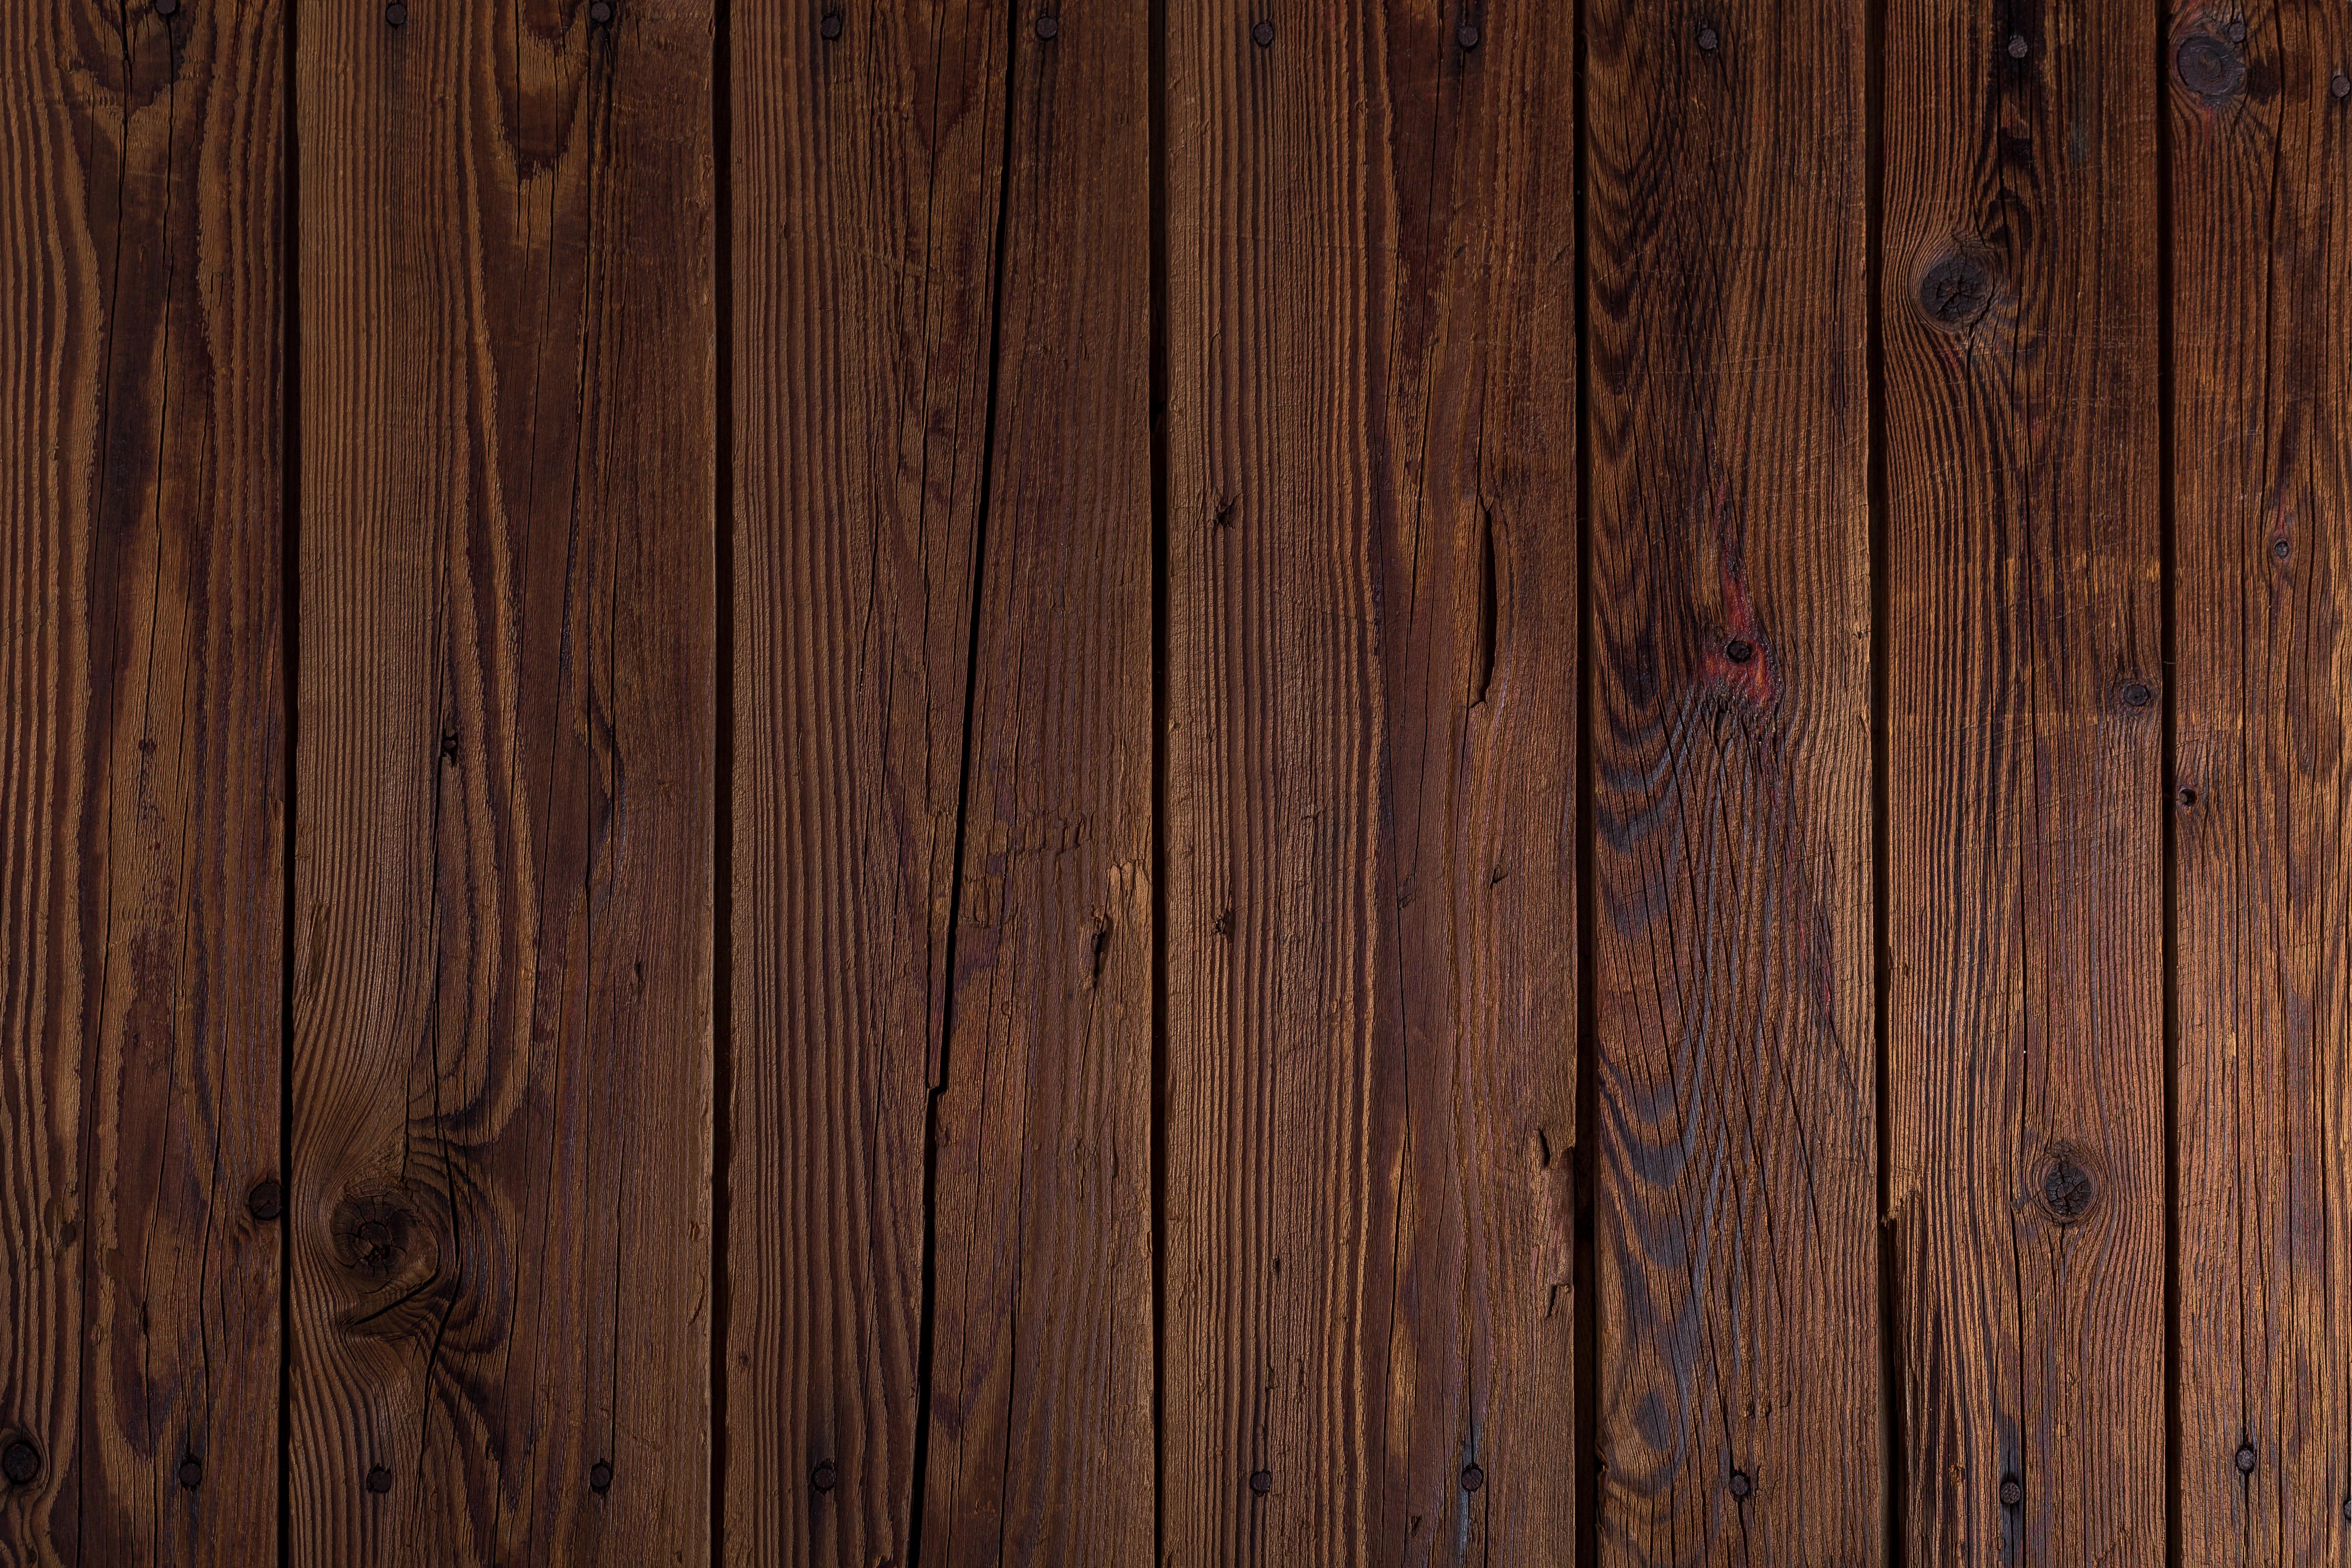 Wooden texture - Photo #1079 -